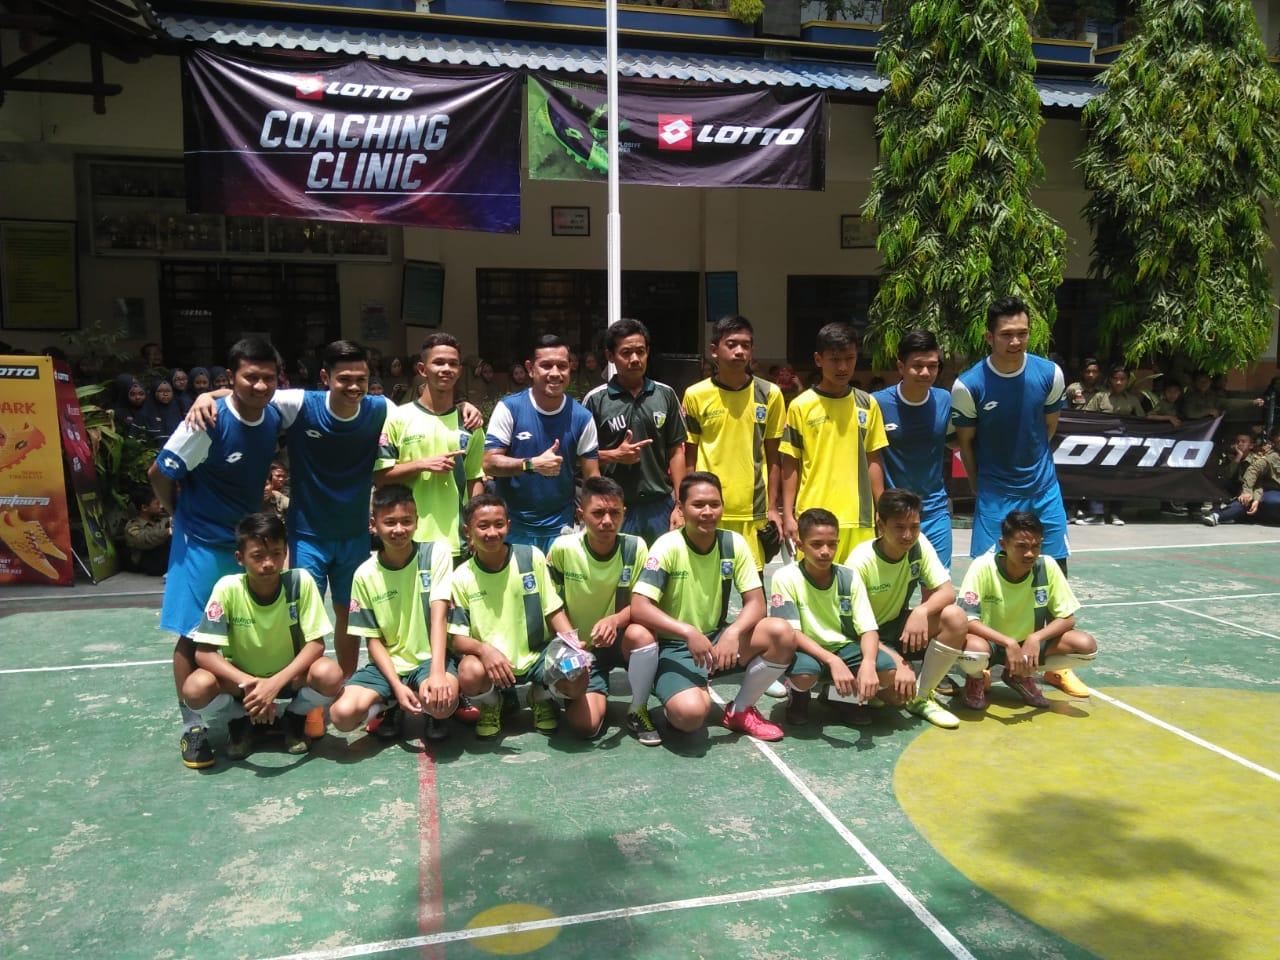 Atlet Futsal Ambassador Lotto Adakan Coaching Clinic Di SMP Muh 1